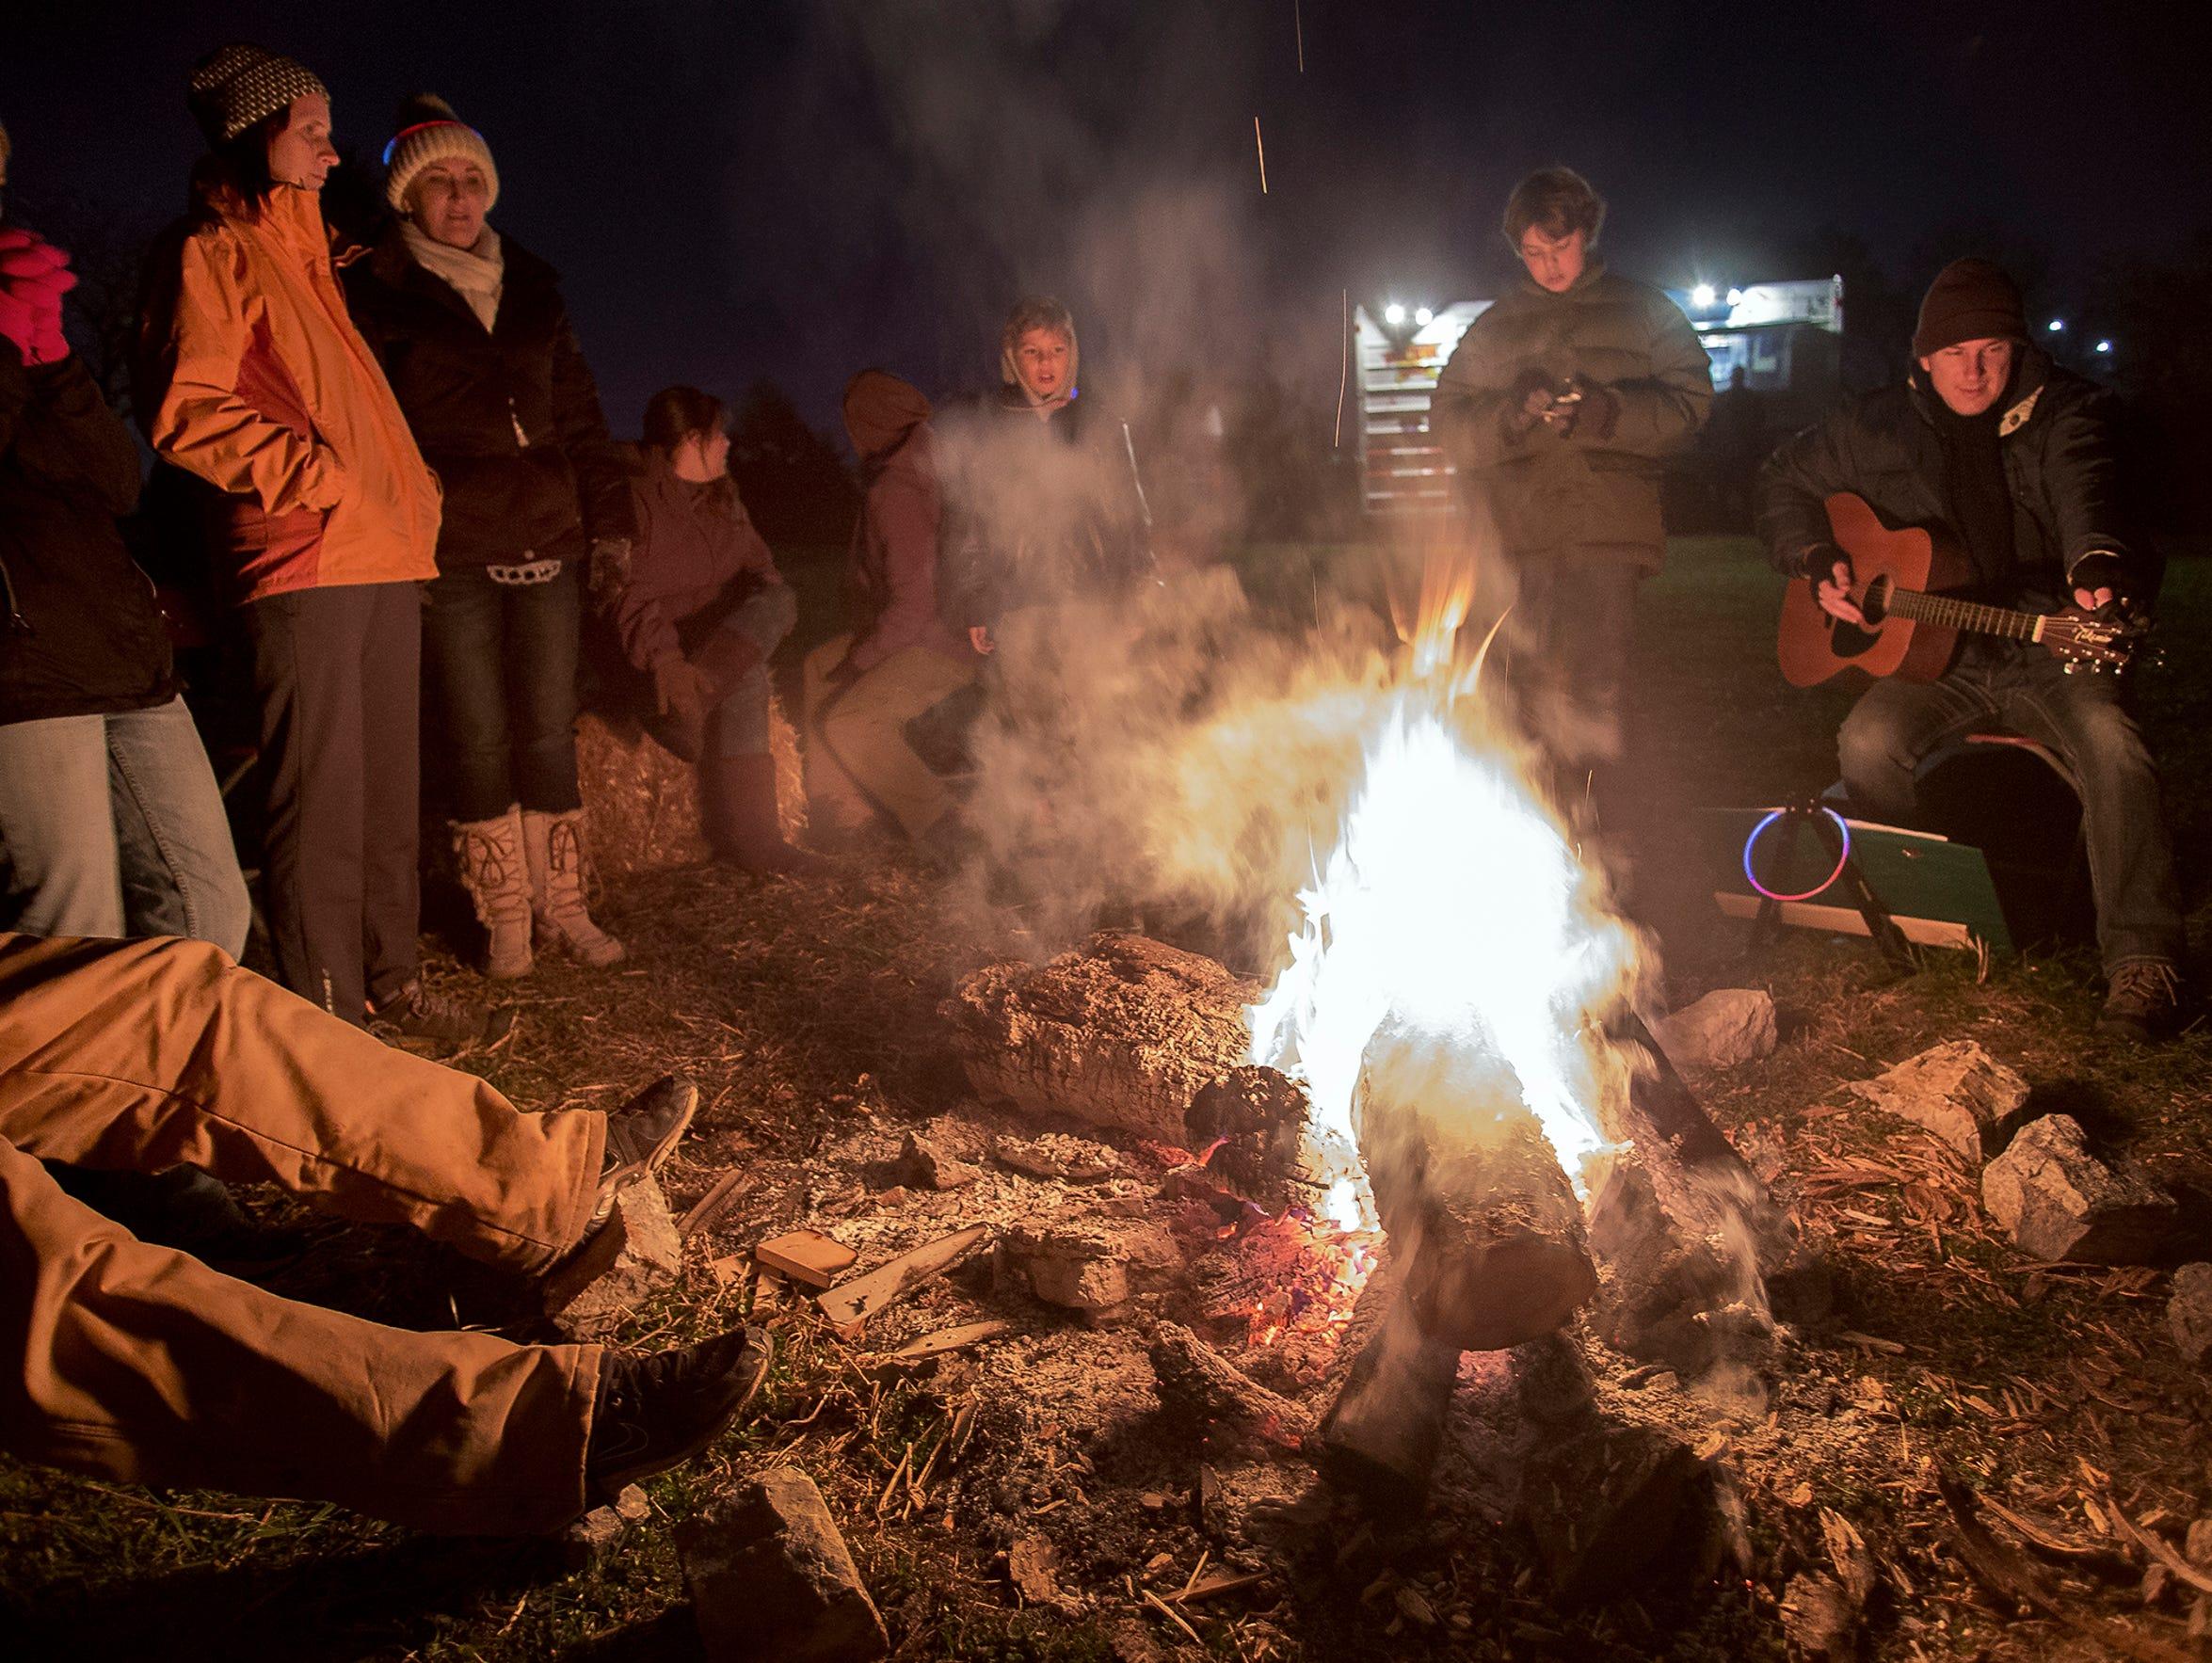 Enjoy a roaring campfire on Saturday.